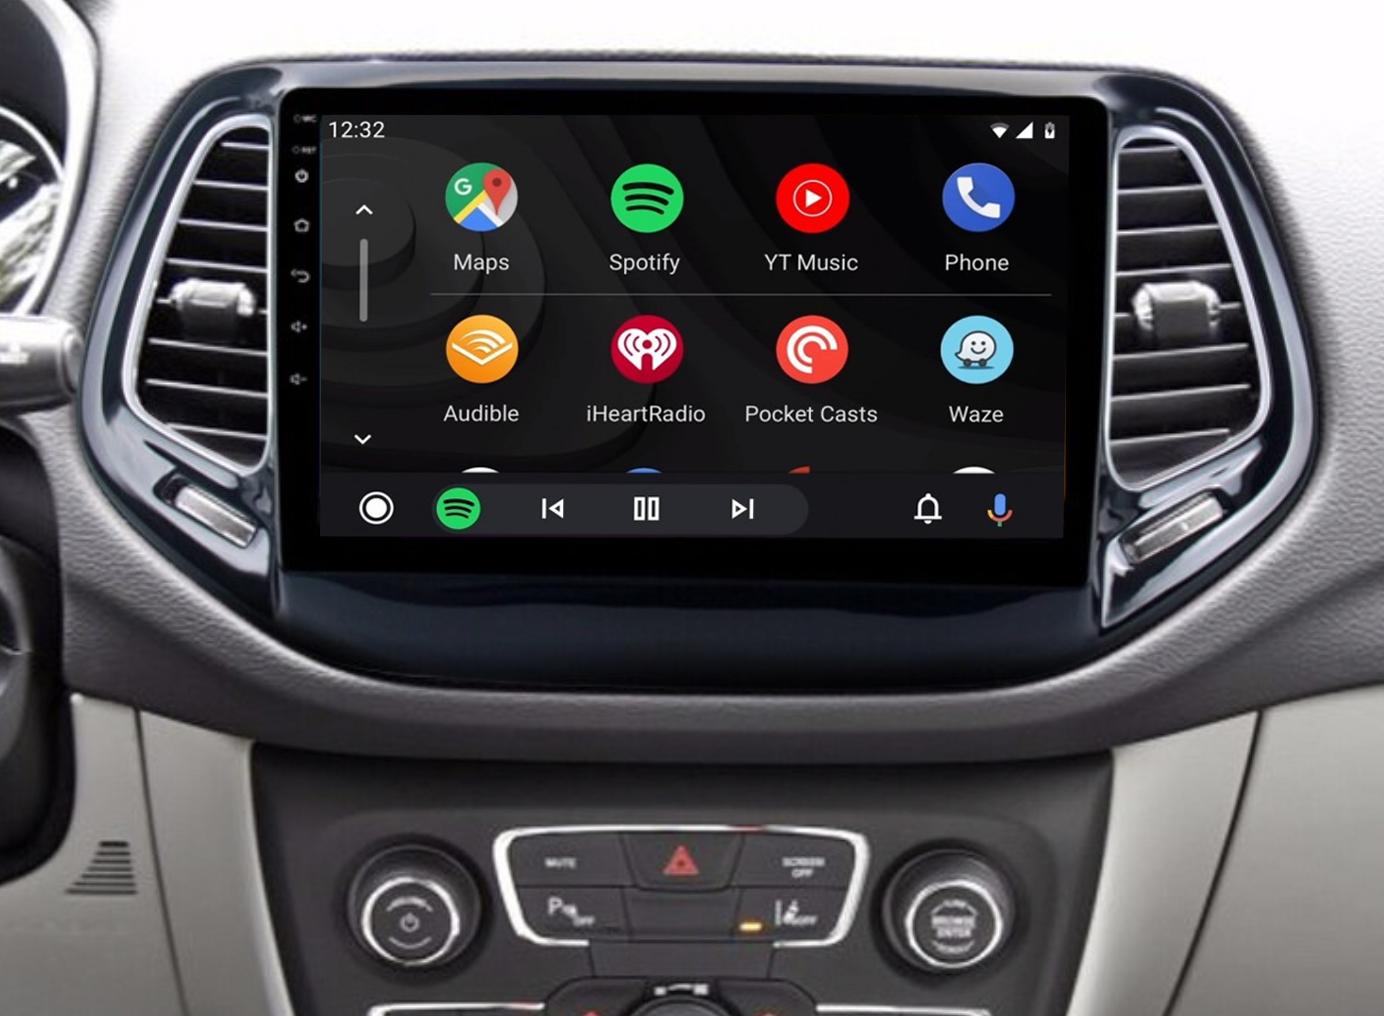 Ecran tactile QLED Android 11.0 + Apple Carplay sans fil Jeep Compass depuis 2017